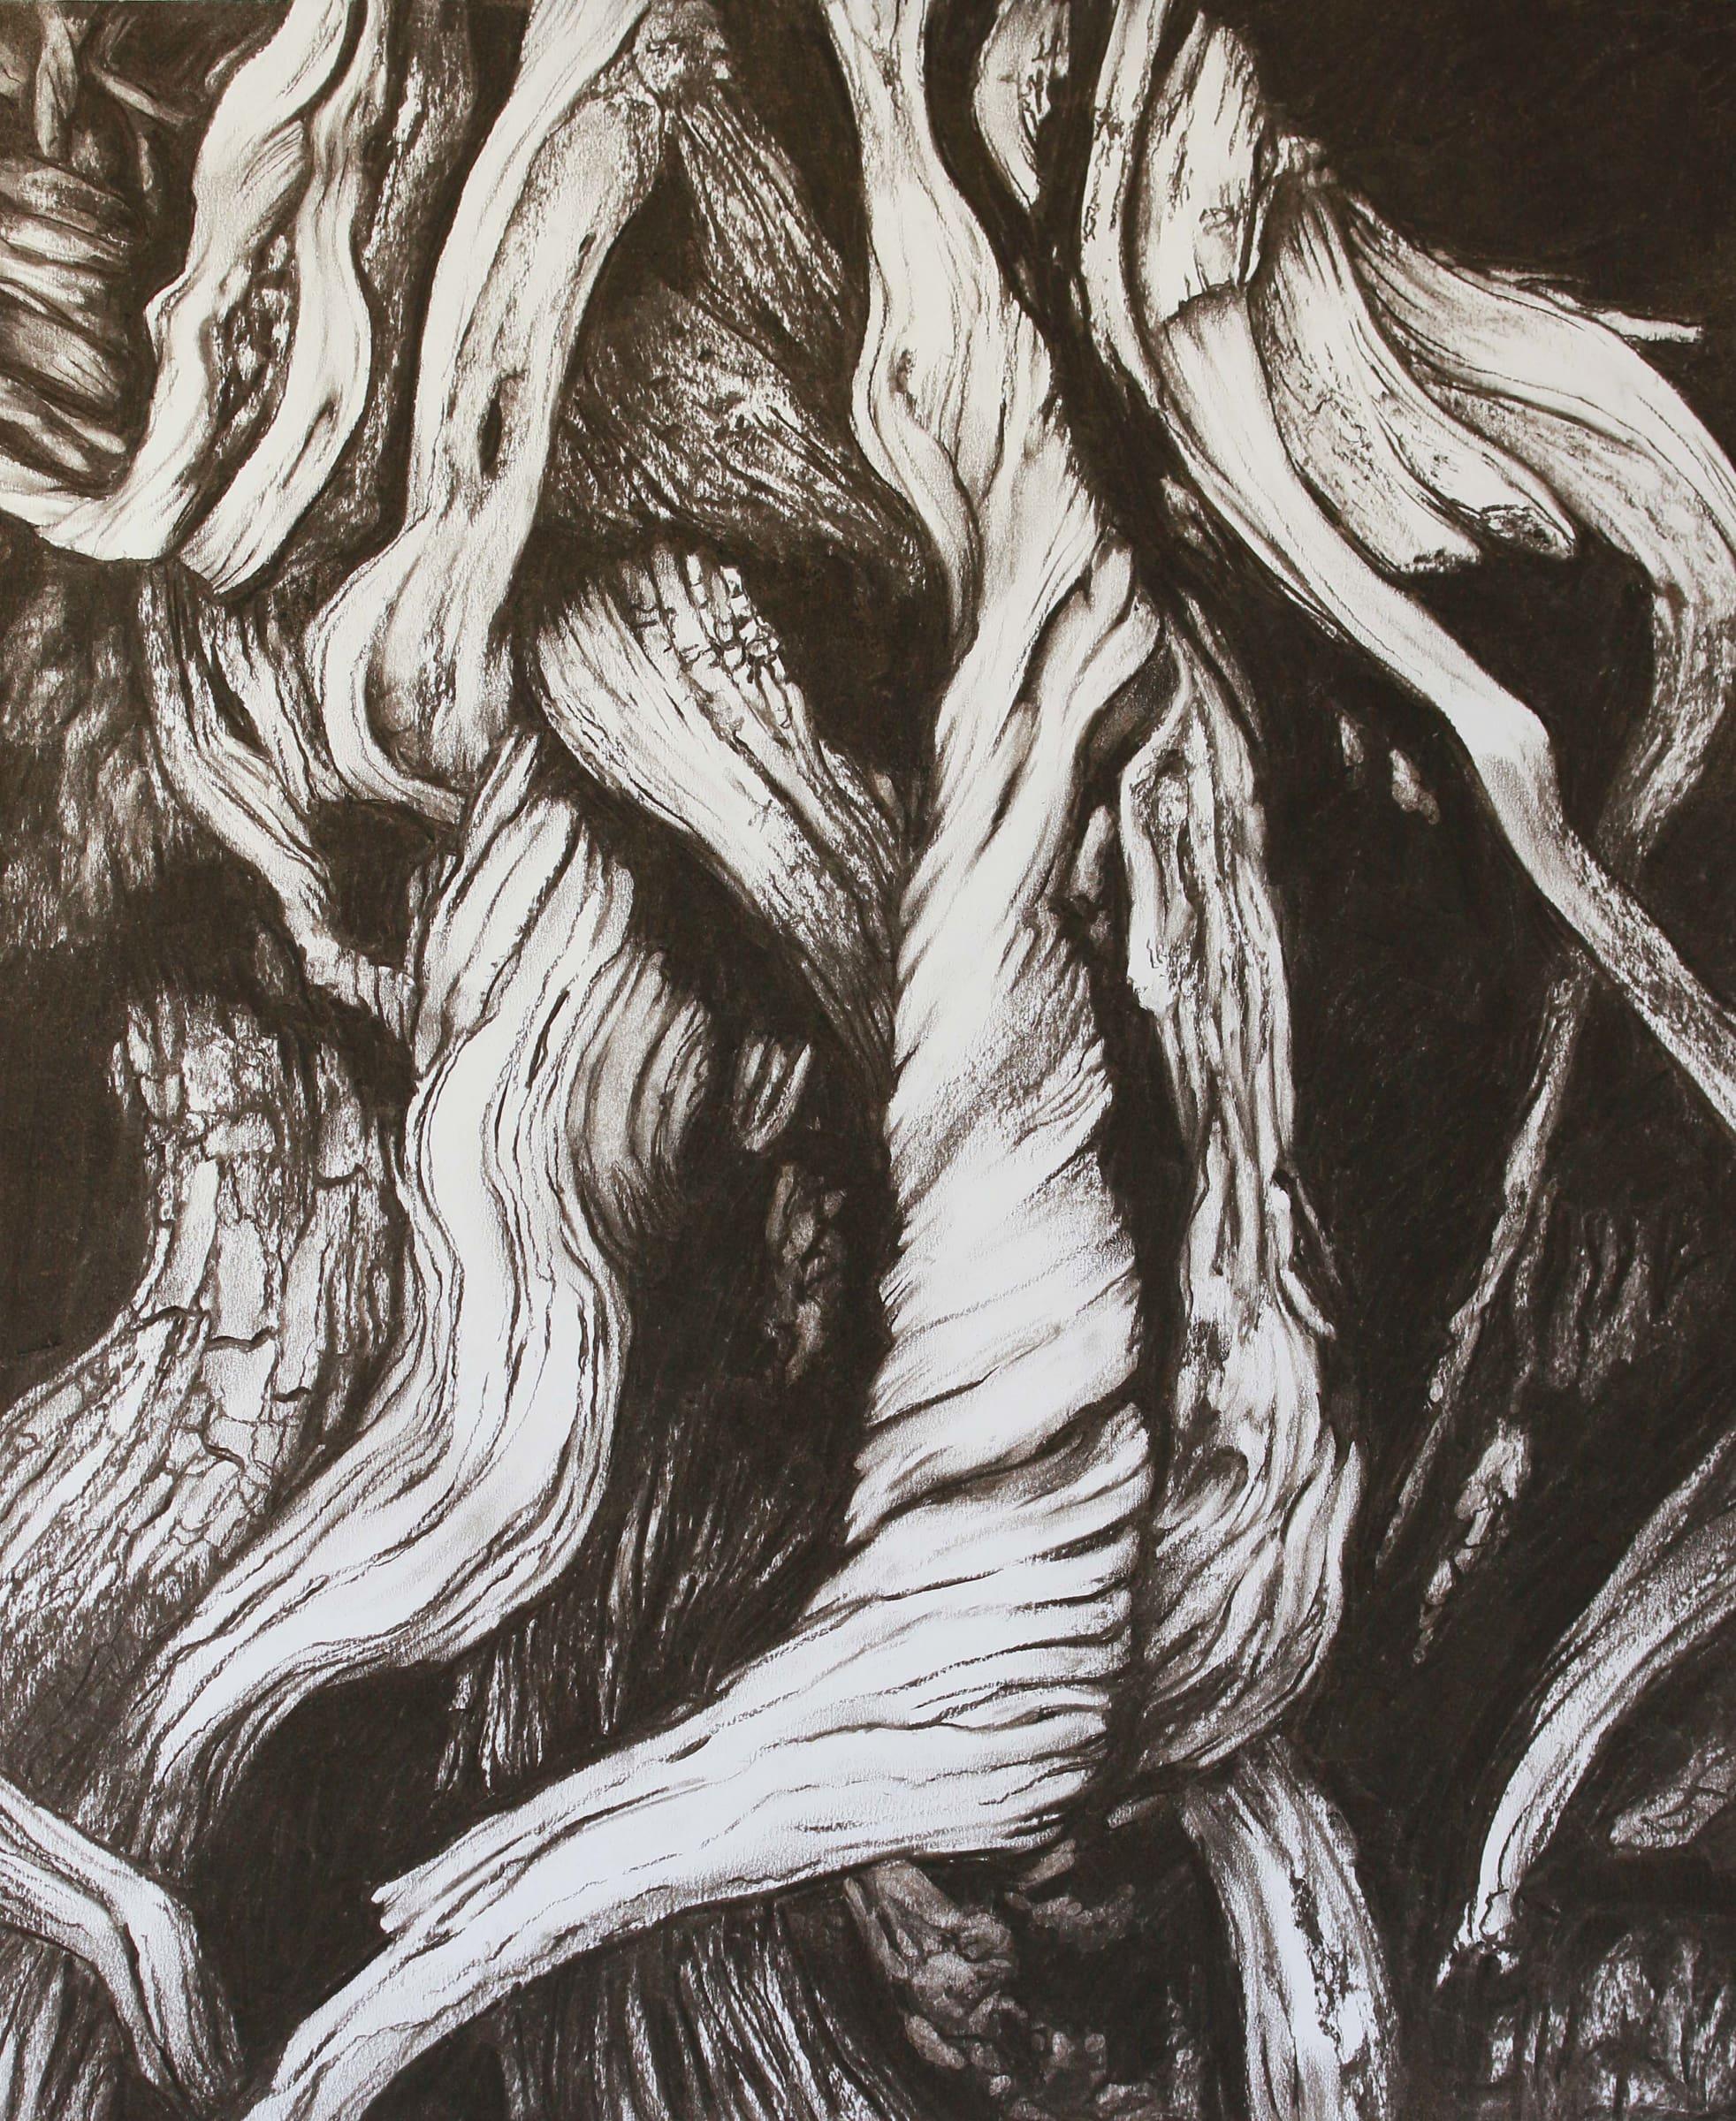 <span class=&#34;link fancybox-details-link&#34;><a href=&#34;/artists/71-leonora-venter/works/3042-leonora-venter-driftwood-v-2018/&#34;>View Detail Page</a></span><div class=&#34;artist&#34;><strong>Leonora Venter</strong></div> <div class=&#34;title&#34;><em>Driftwood V</em>, 2018</div> <div class=&#34;medium&#34;>Charcoal On Paper</div> <div class=&#34;dimensions&#34;>60cm x 50cm</div><div class=&#34;price&#34;>R4,000.00</div>